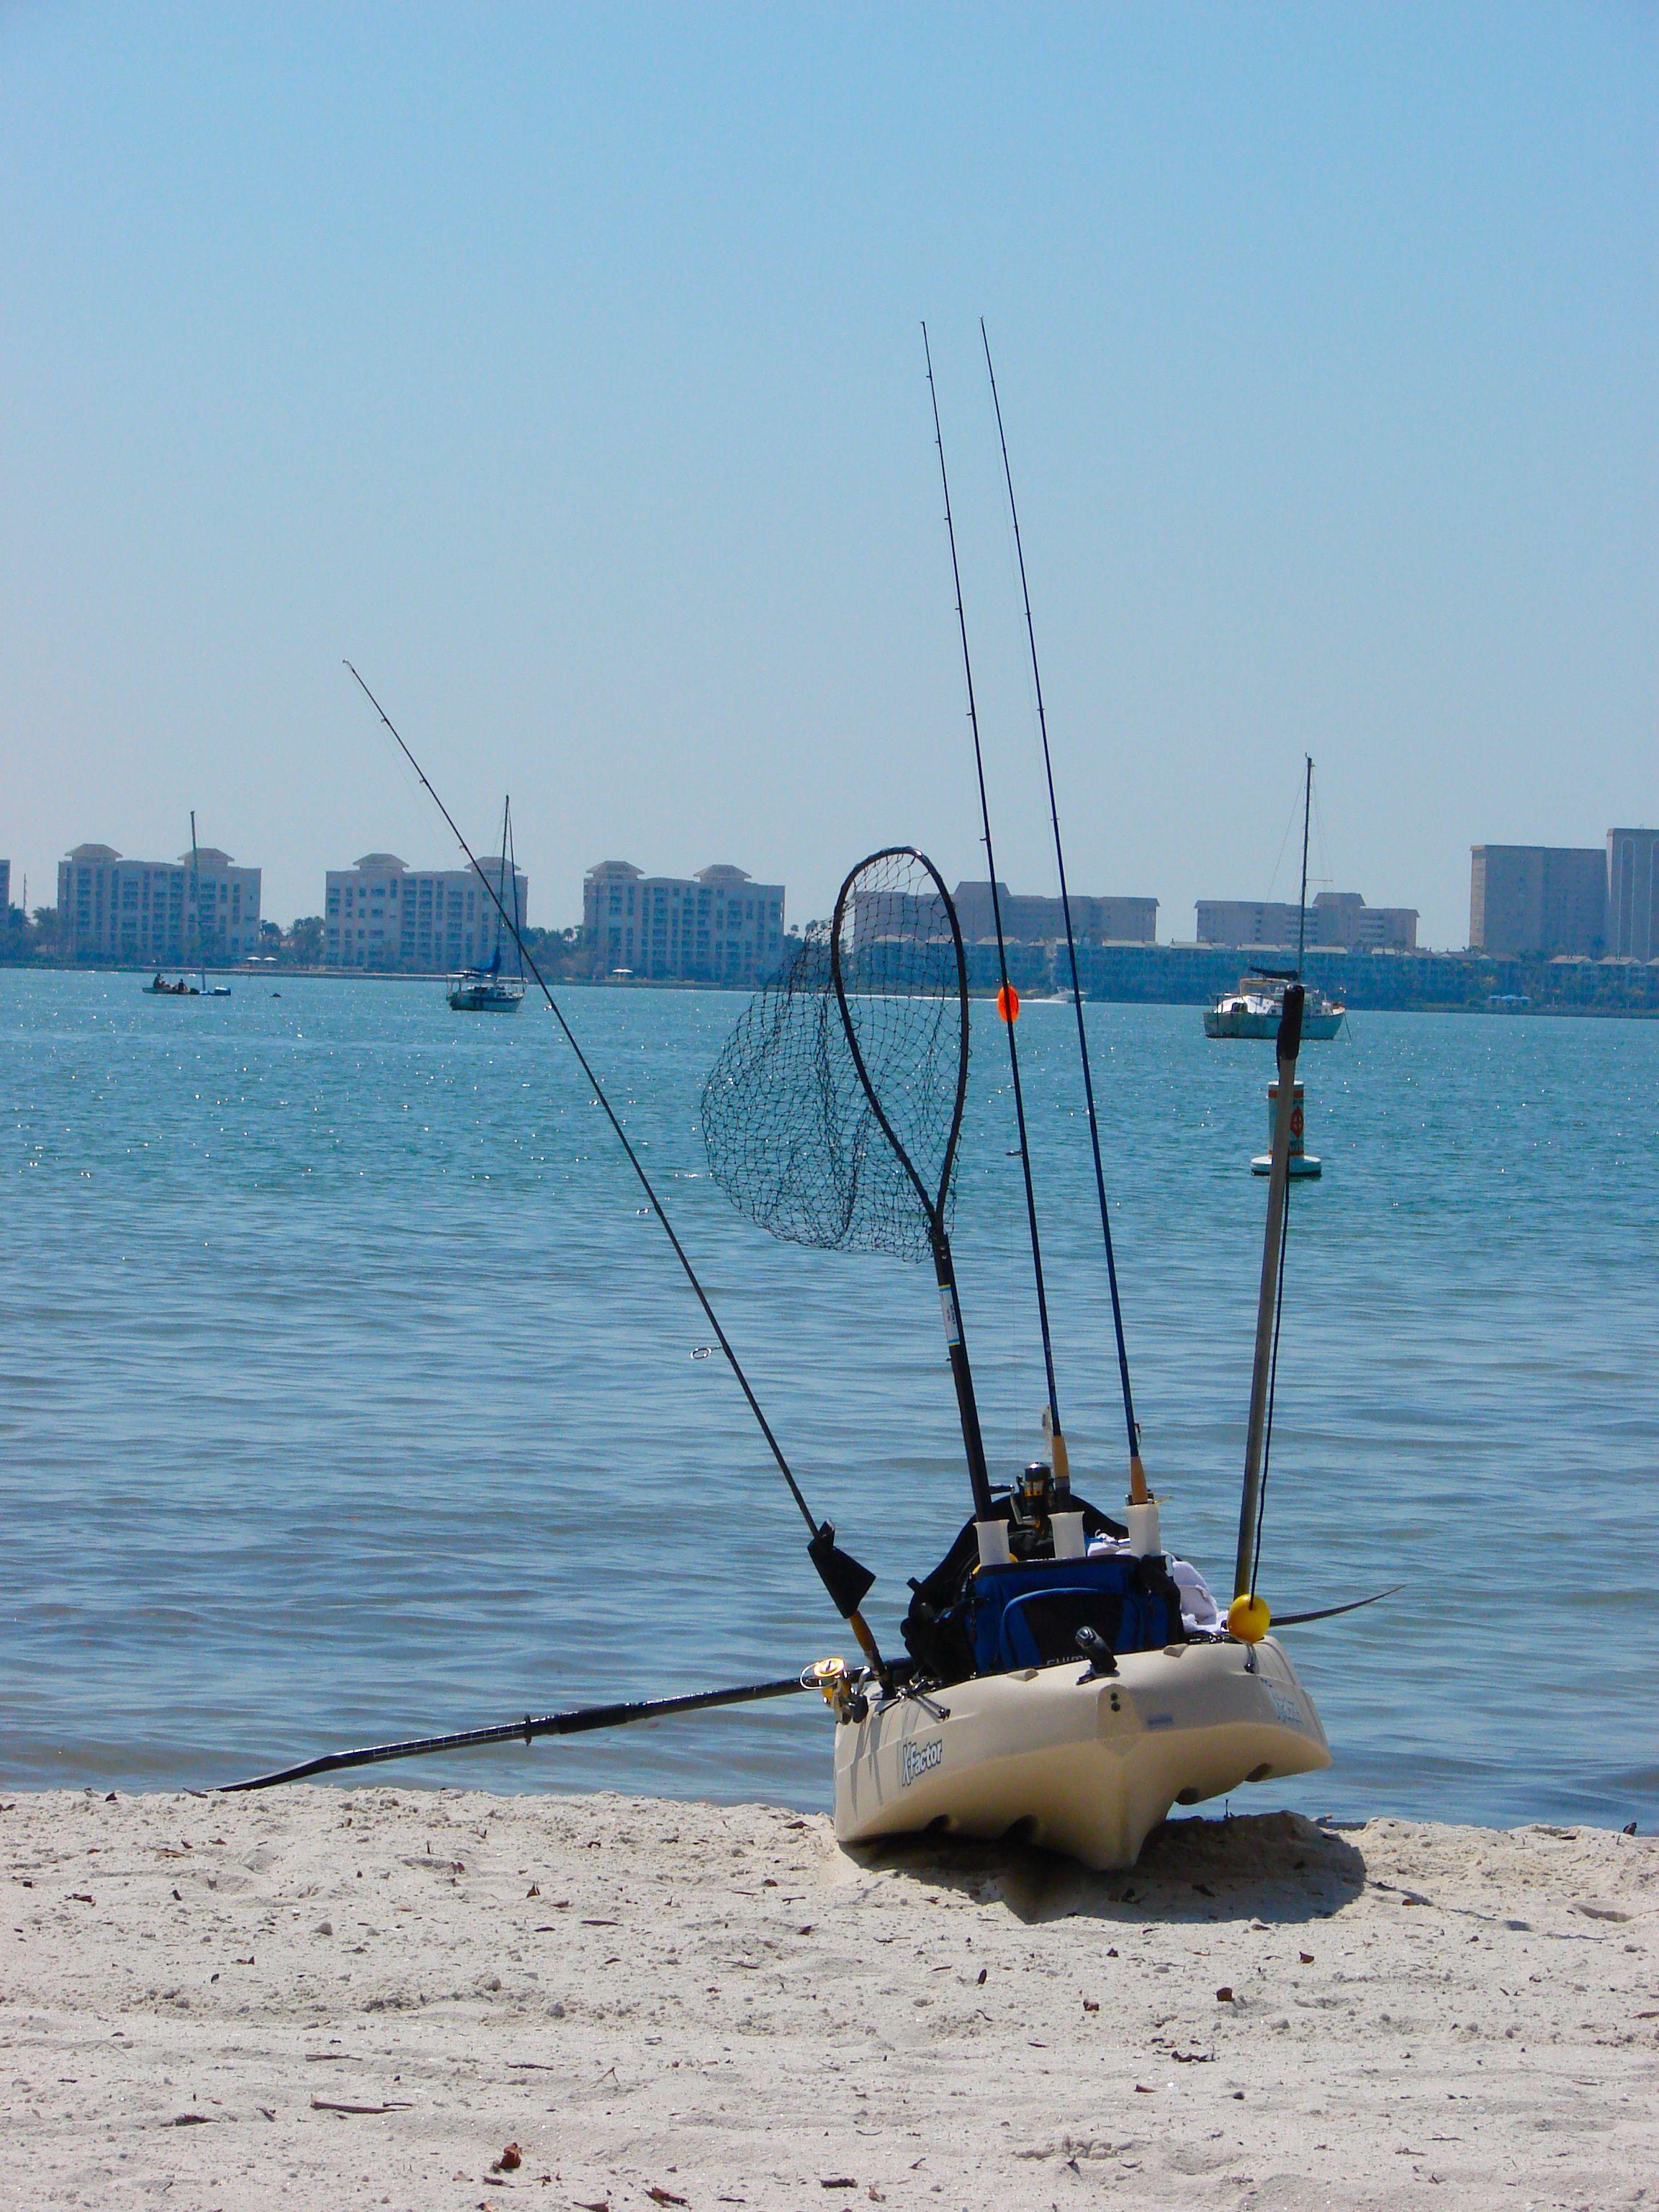 Kayak Parking Gulfport Florida Florida Attractions Gulfport Florida Kayaking